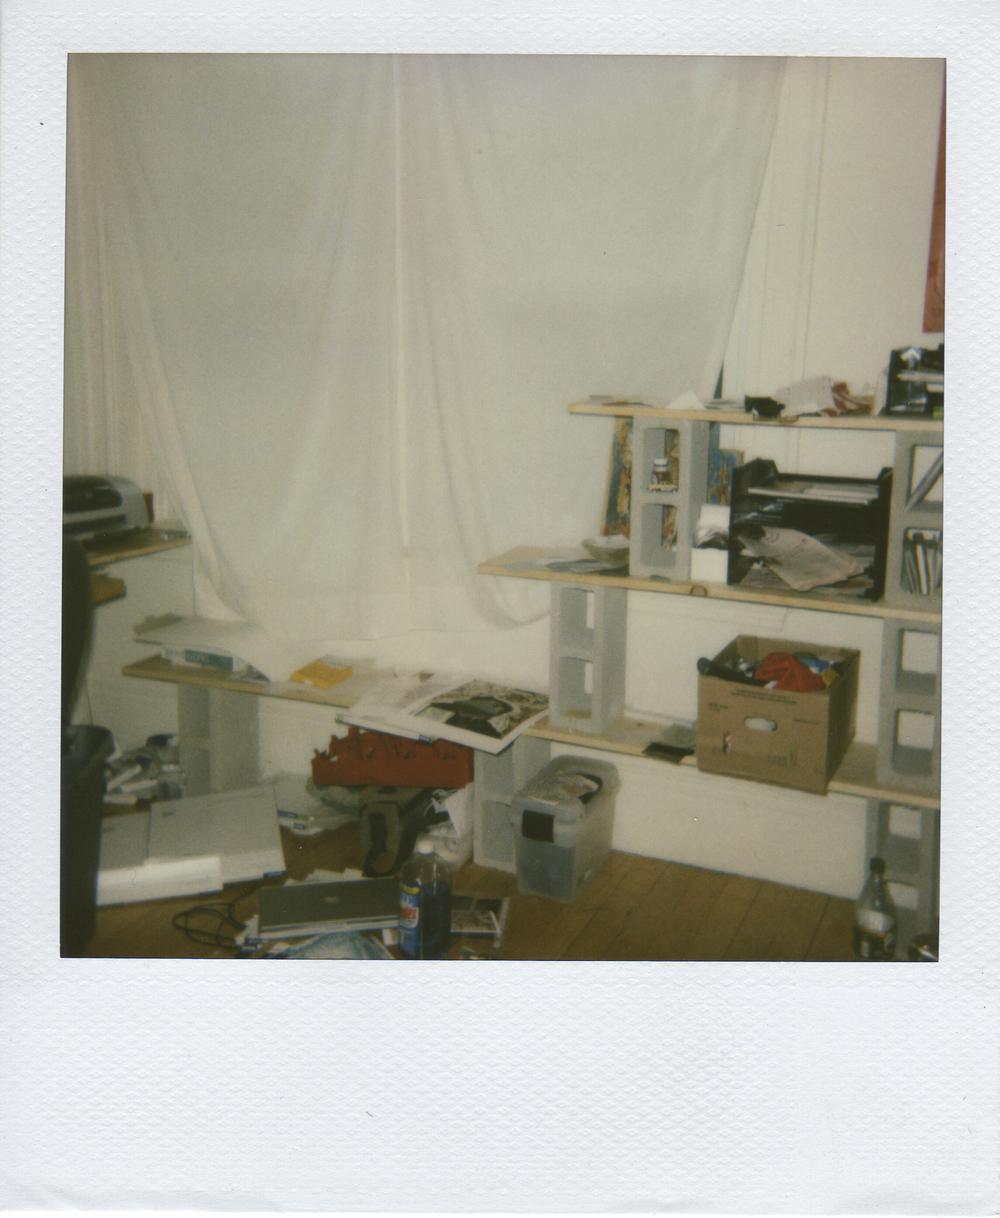 jlaurence-polaroid-144.jpg